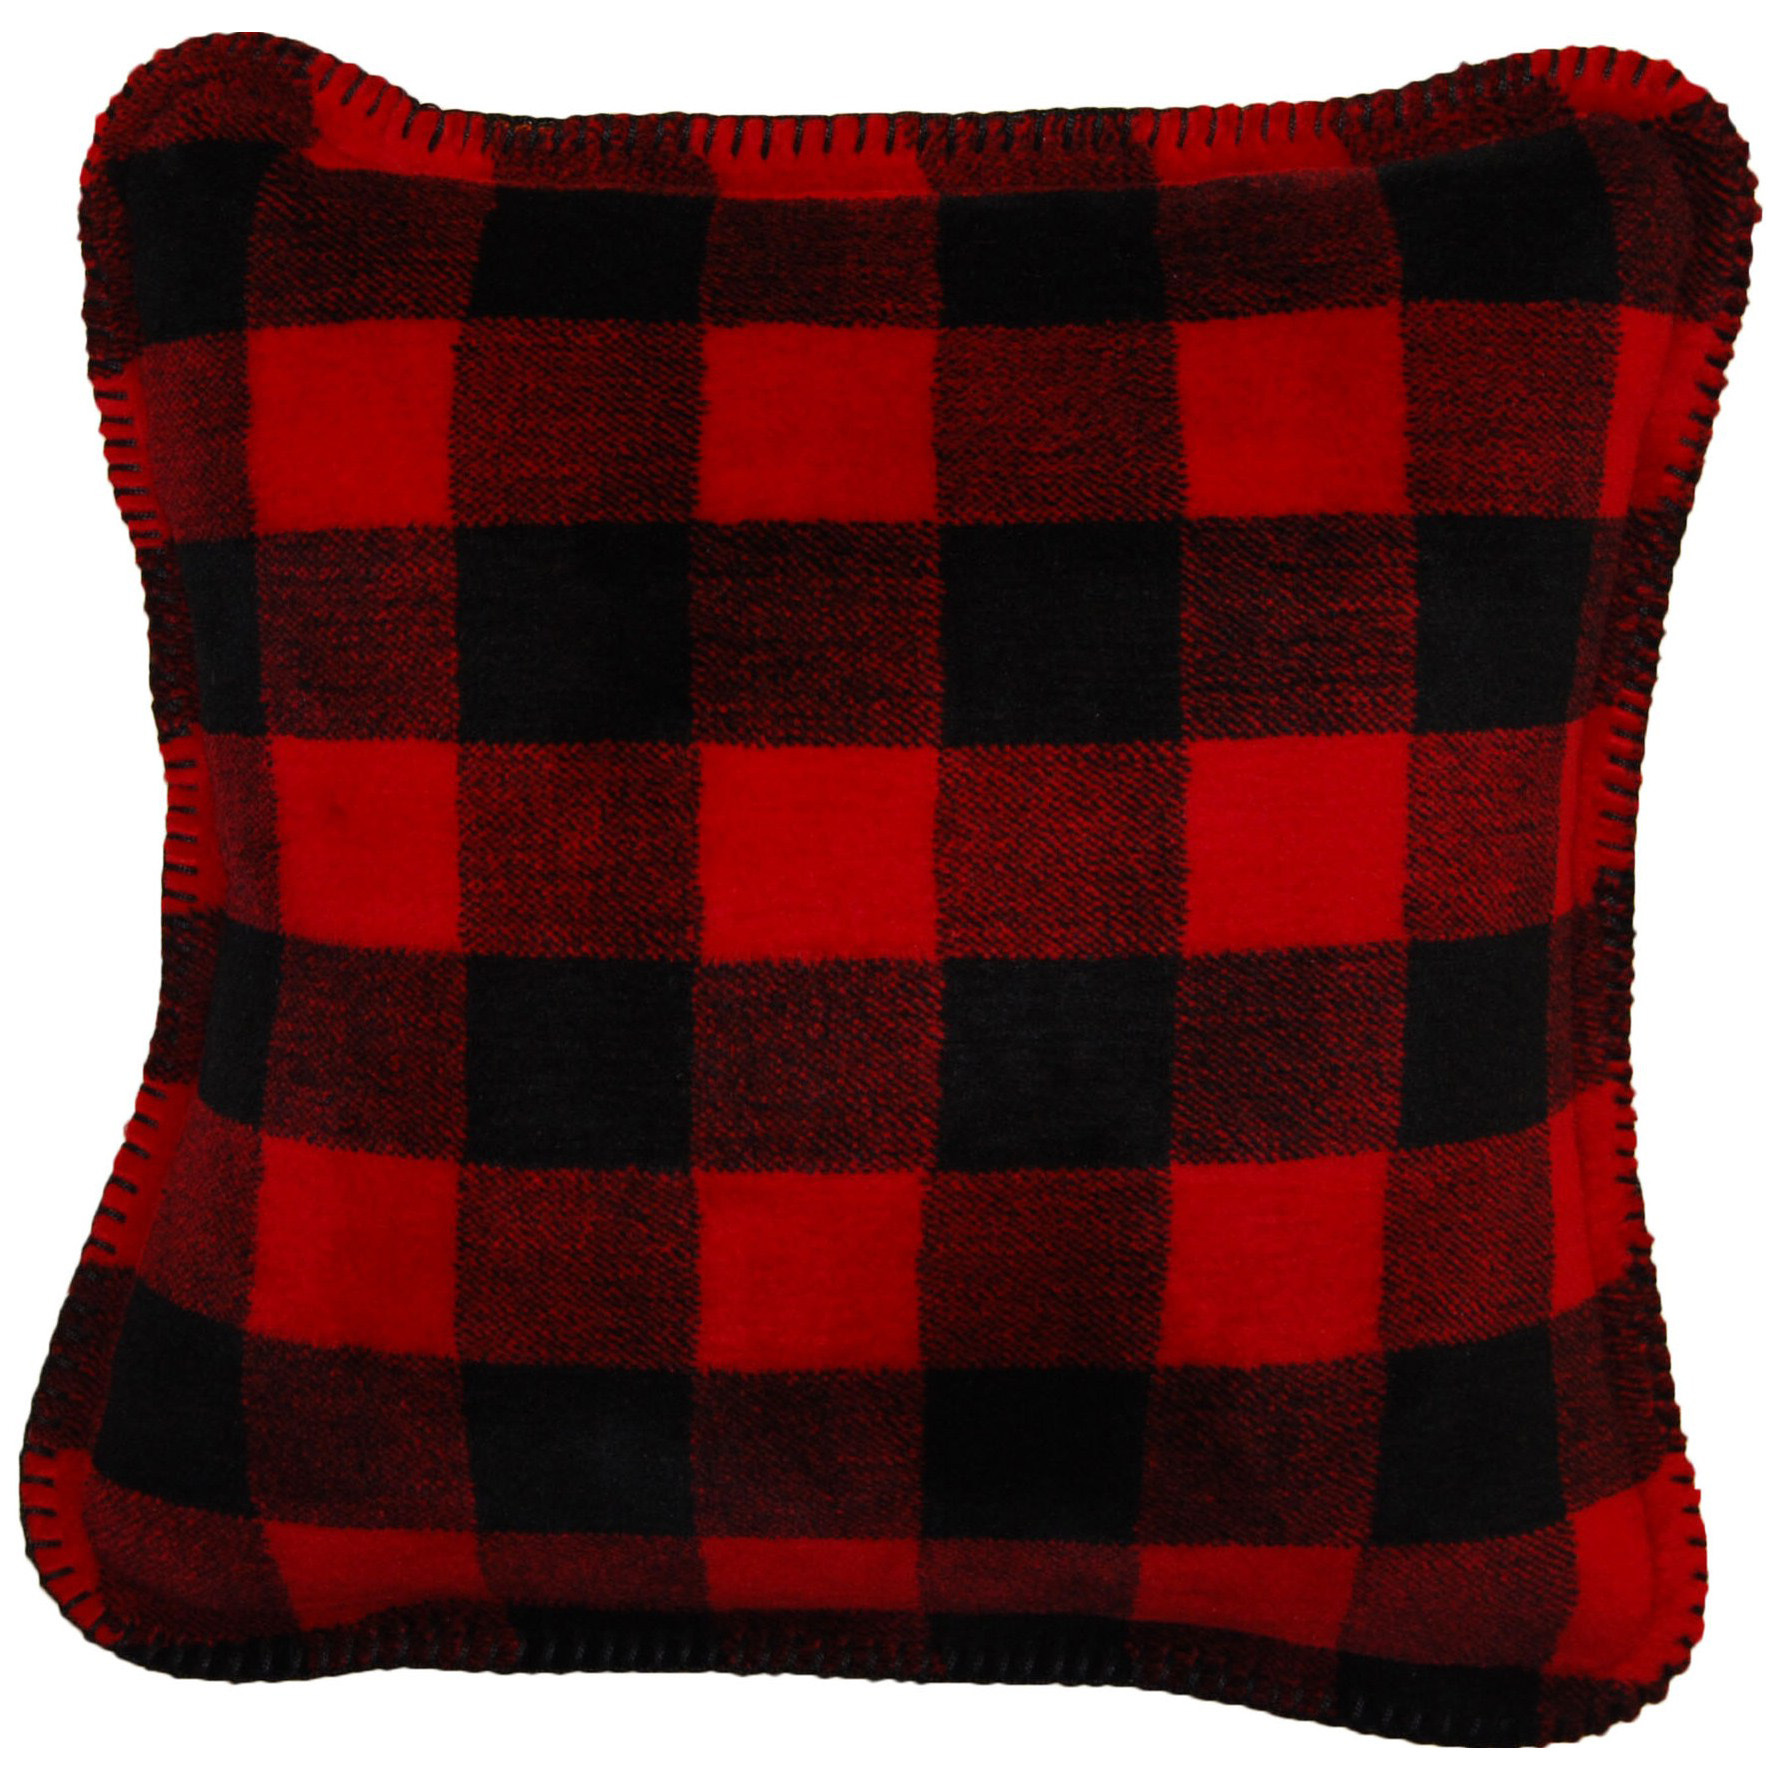 denali home large bunk house 18 inch throw pillow